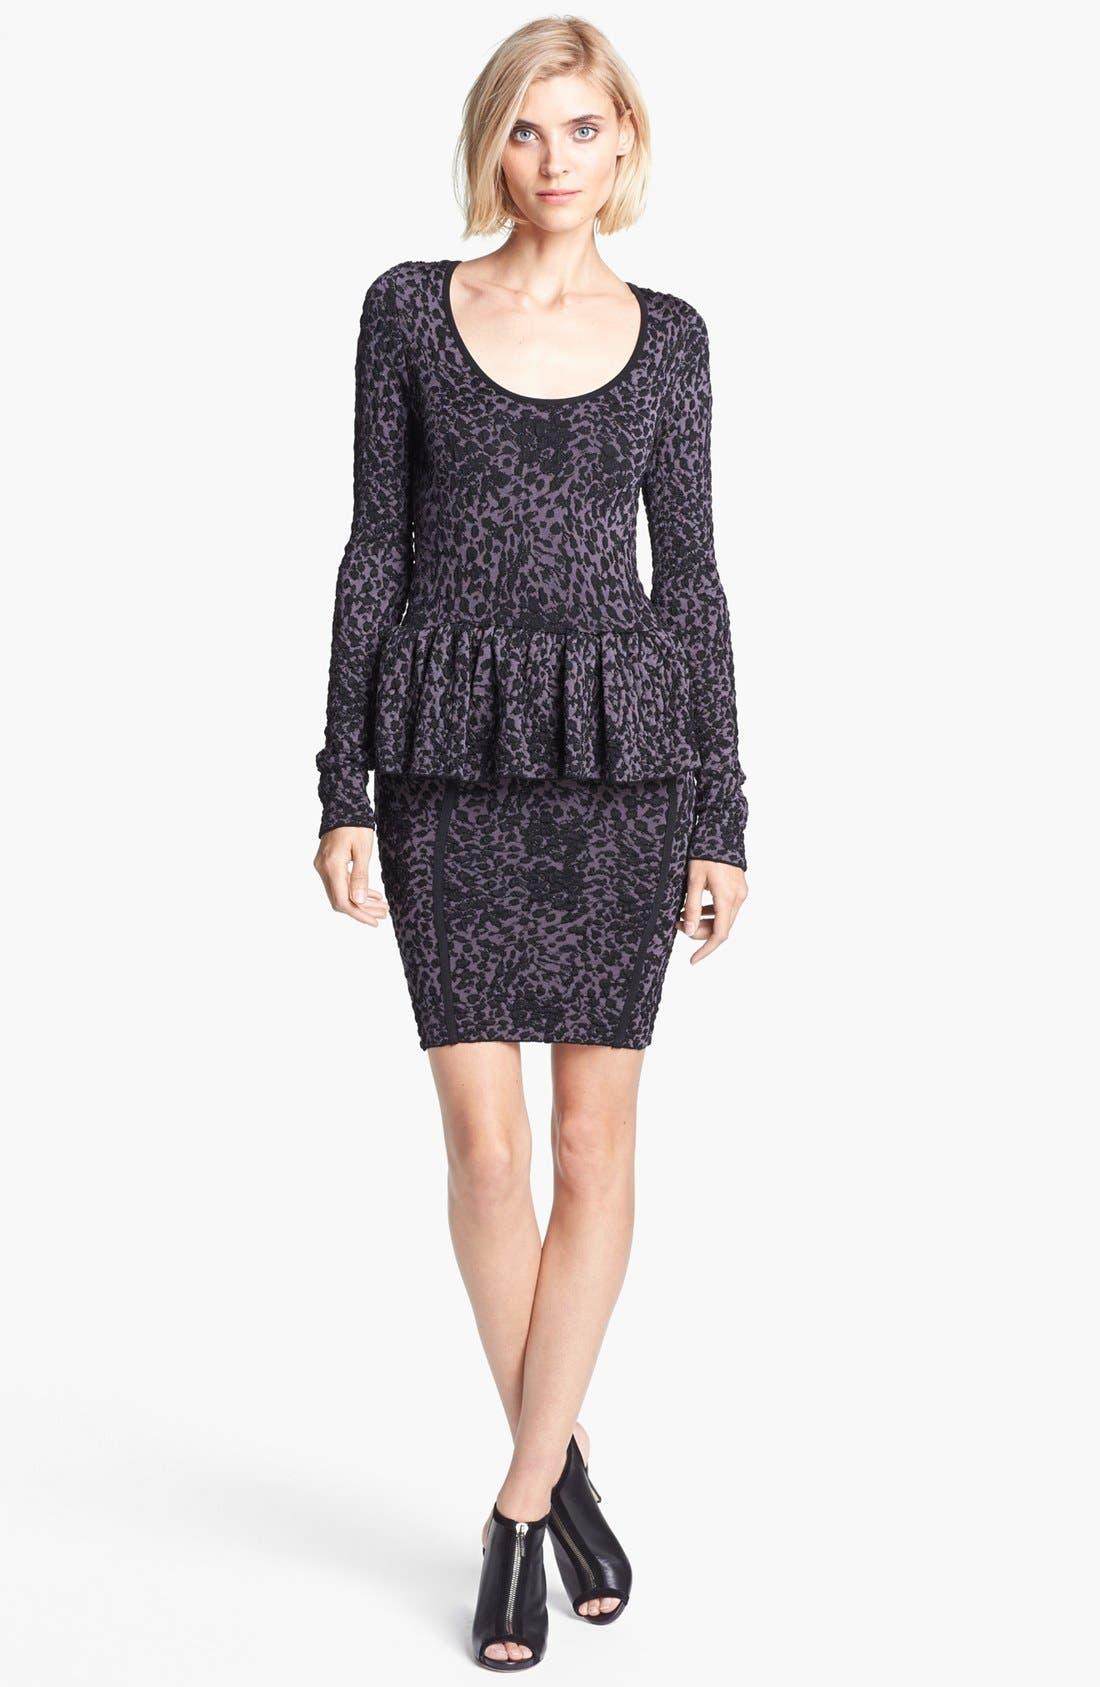 Main Image - Jay Godfrey Leopard Jacquard Knit Peplum Dress